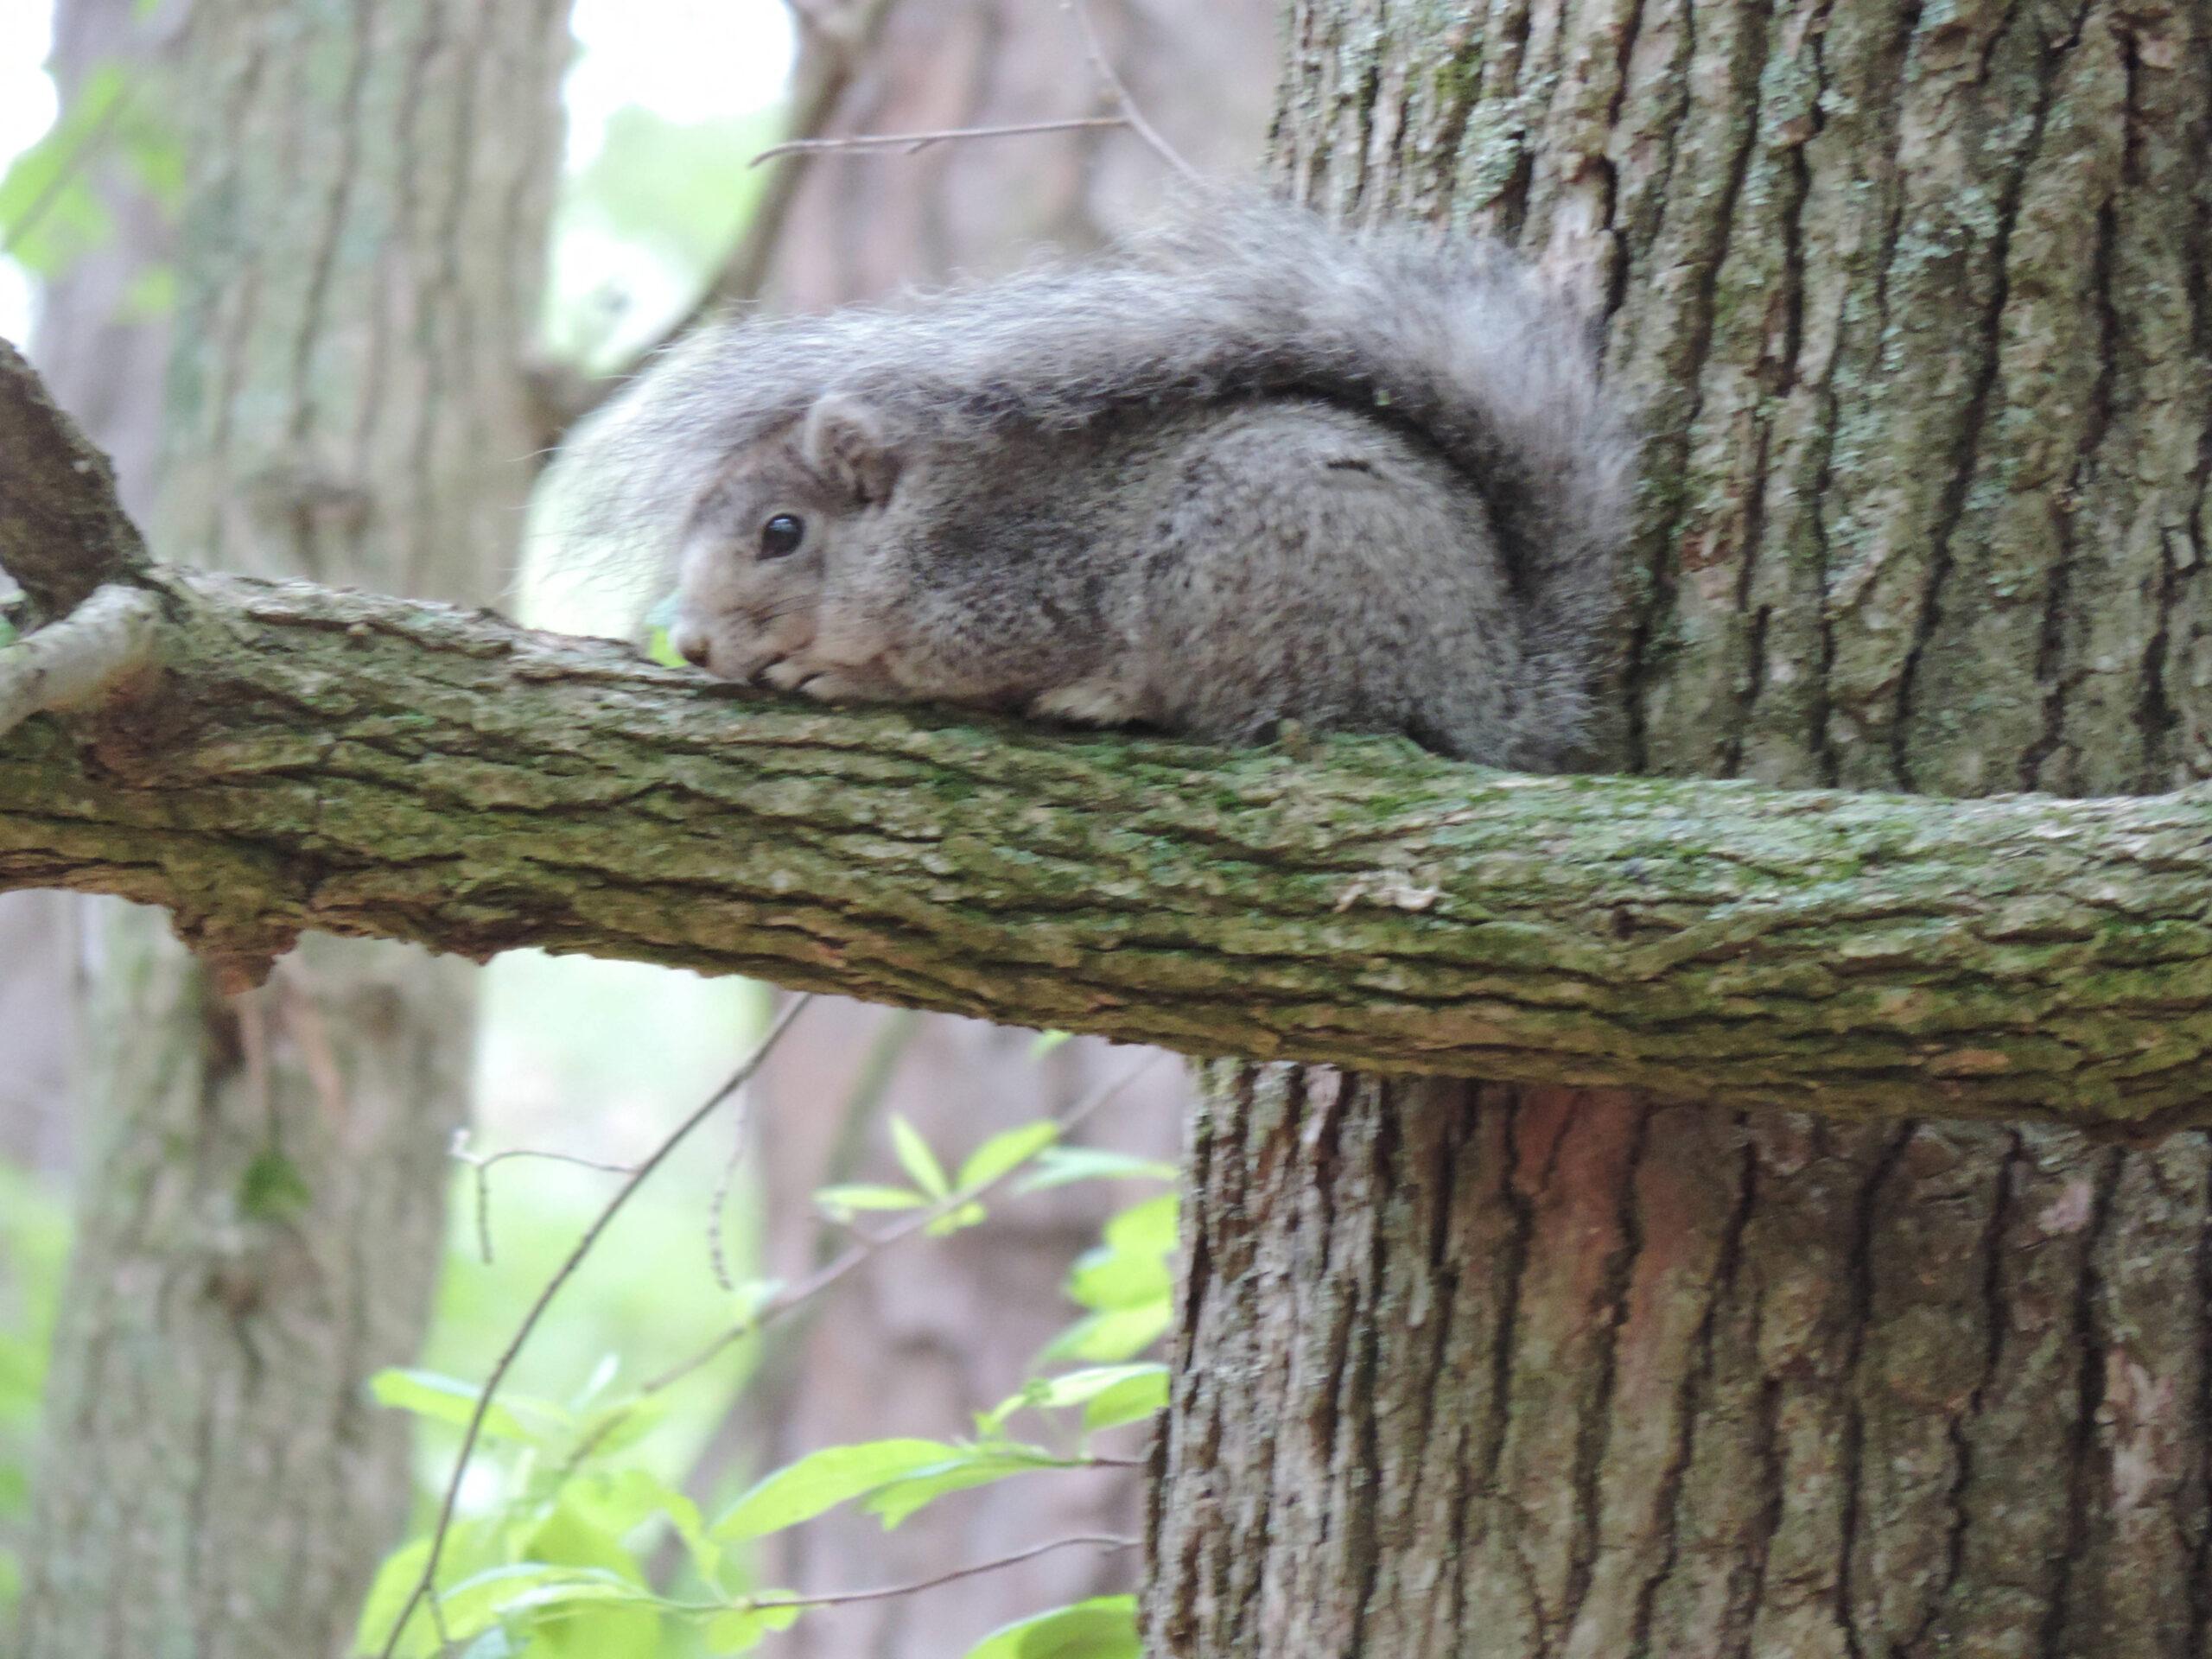 Delmarva fox squirrel laying on tree limb